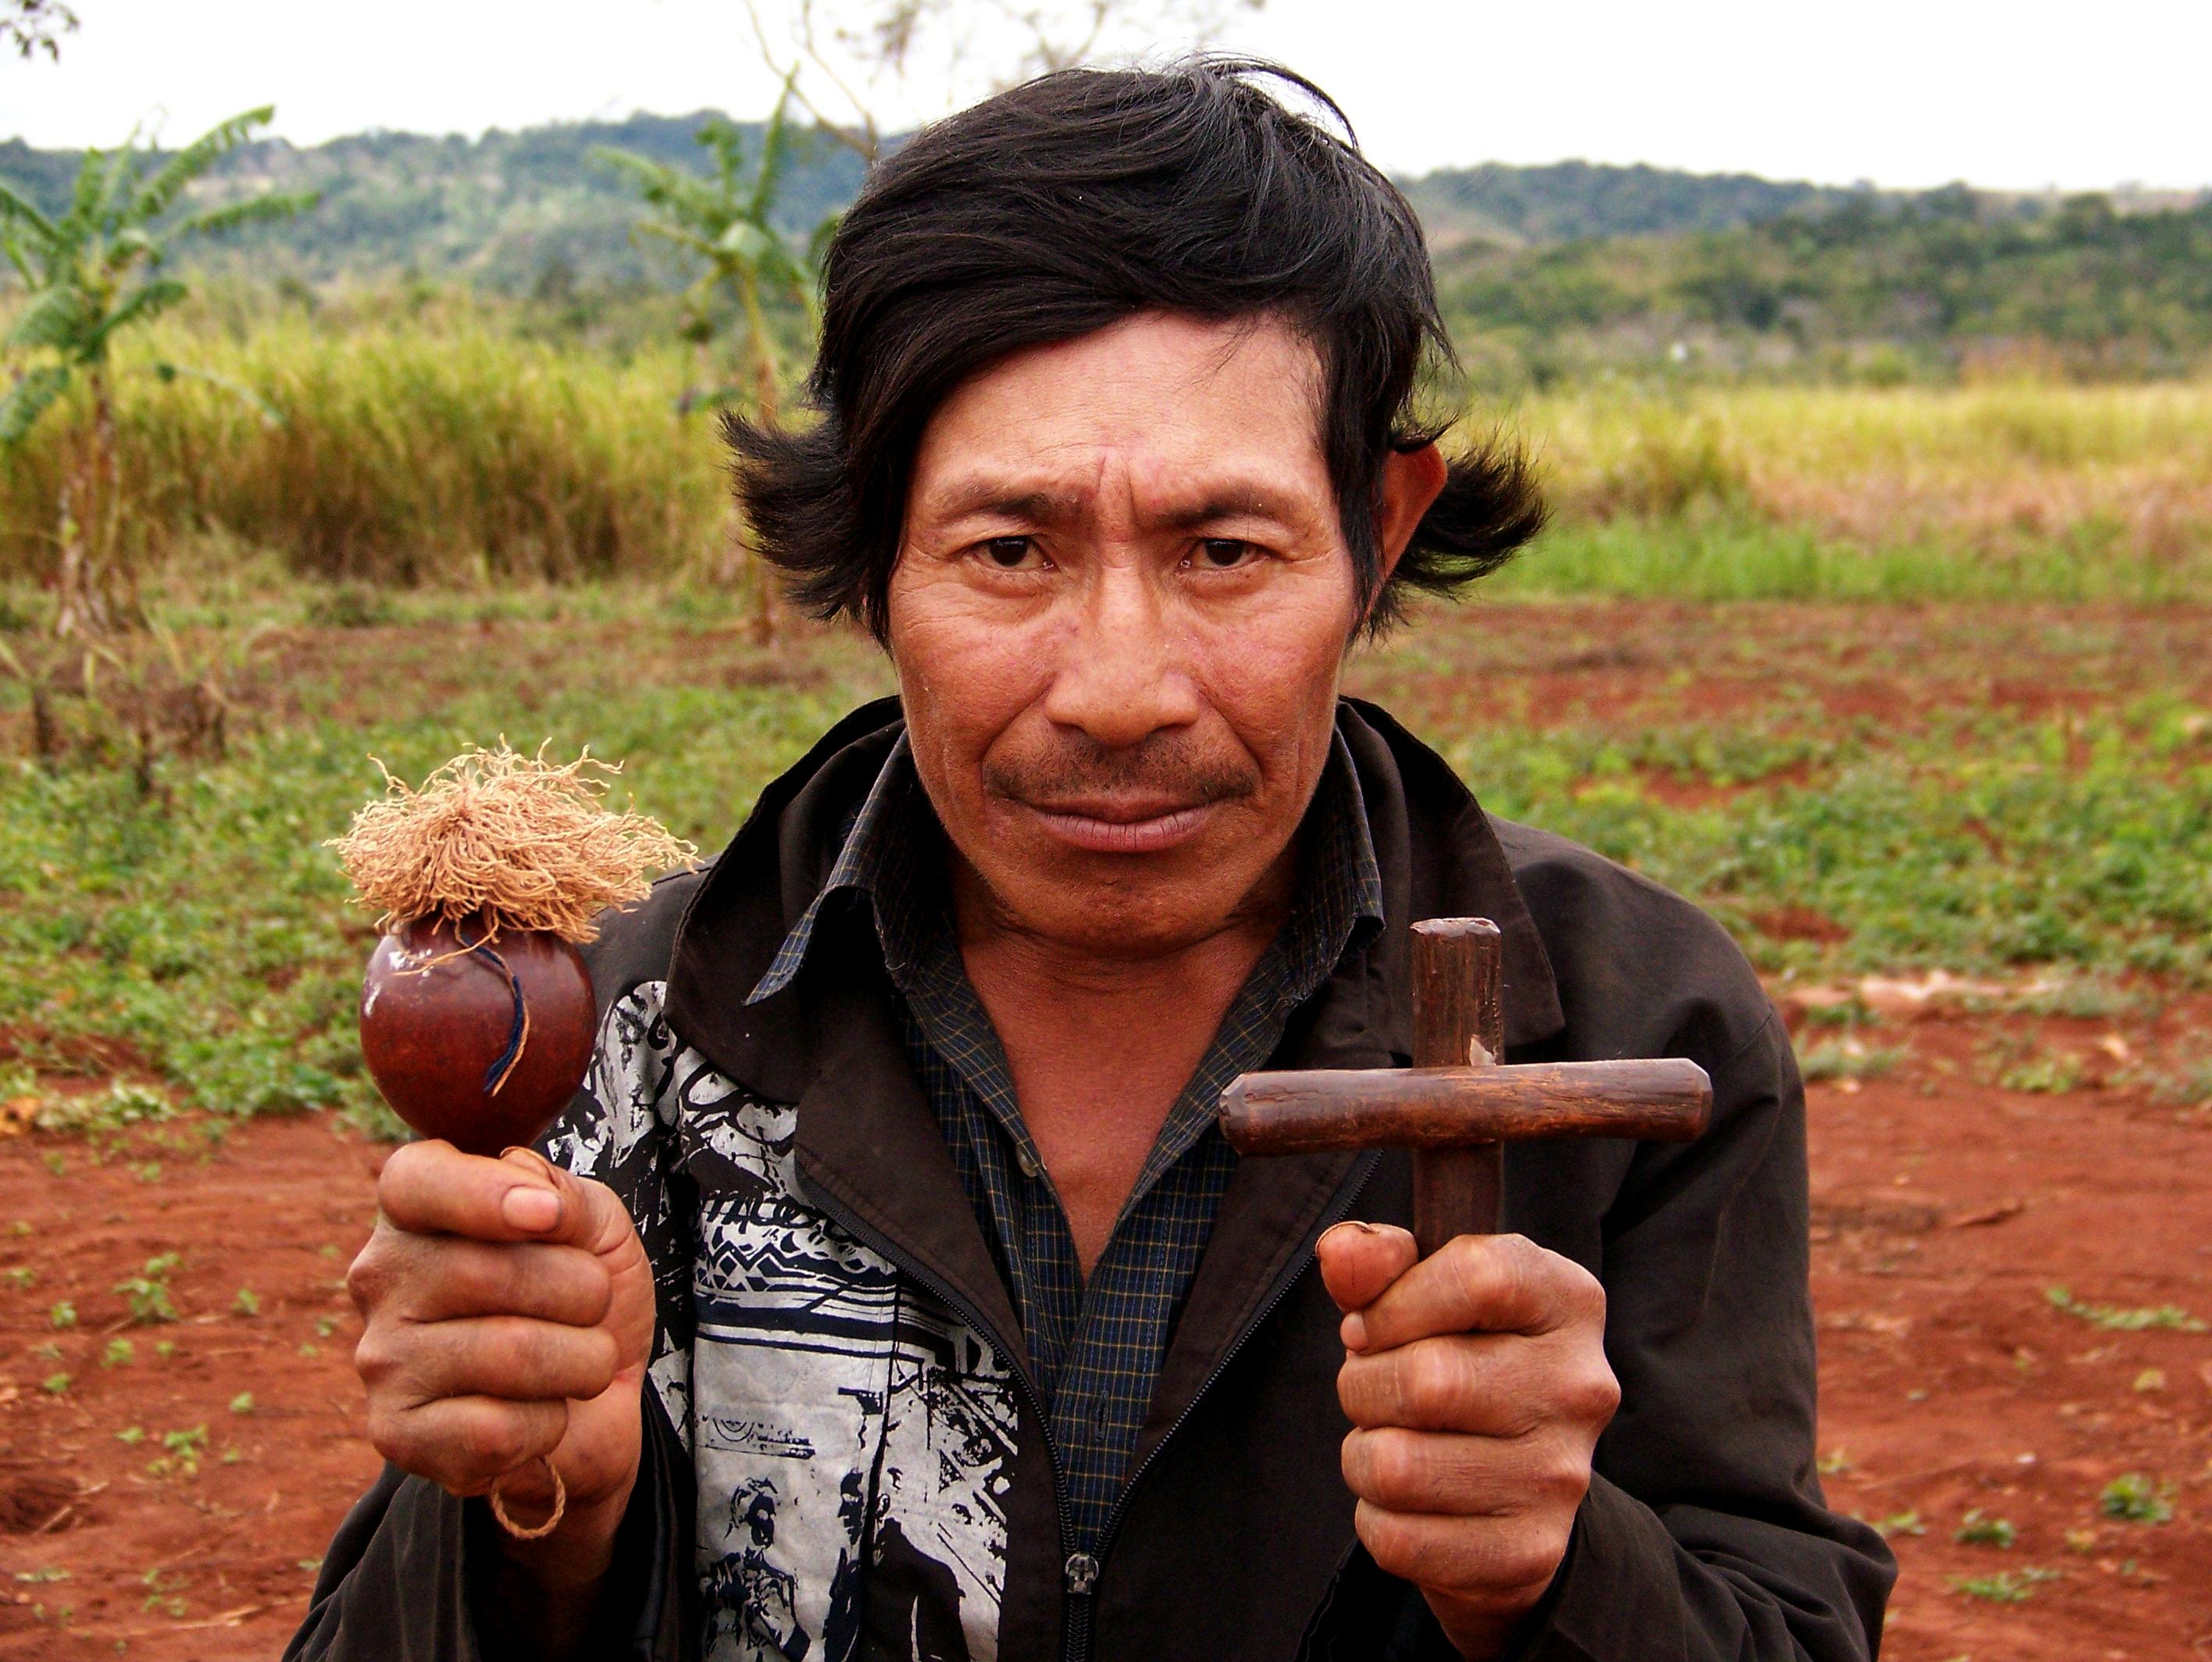 File:Guarani shaman.JPG